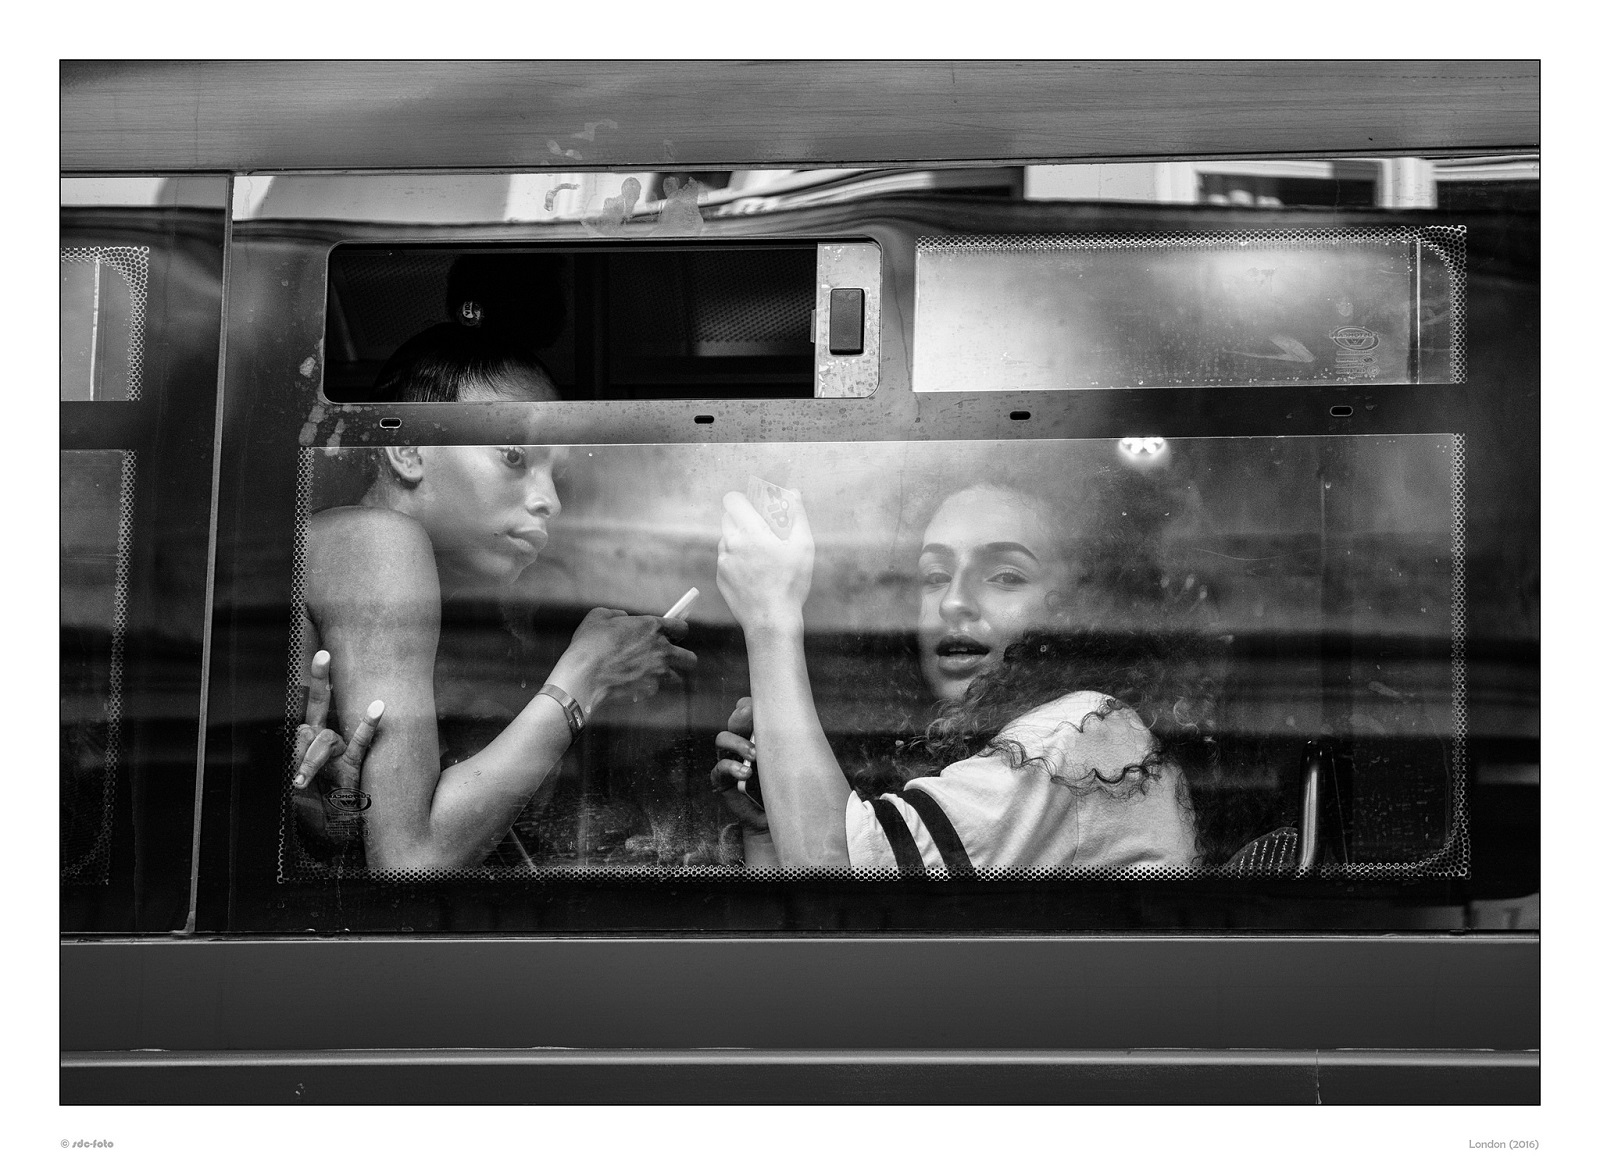 Featured Street Photographer of the Week: Reimund Schmidt-De Caluwe